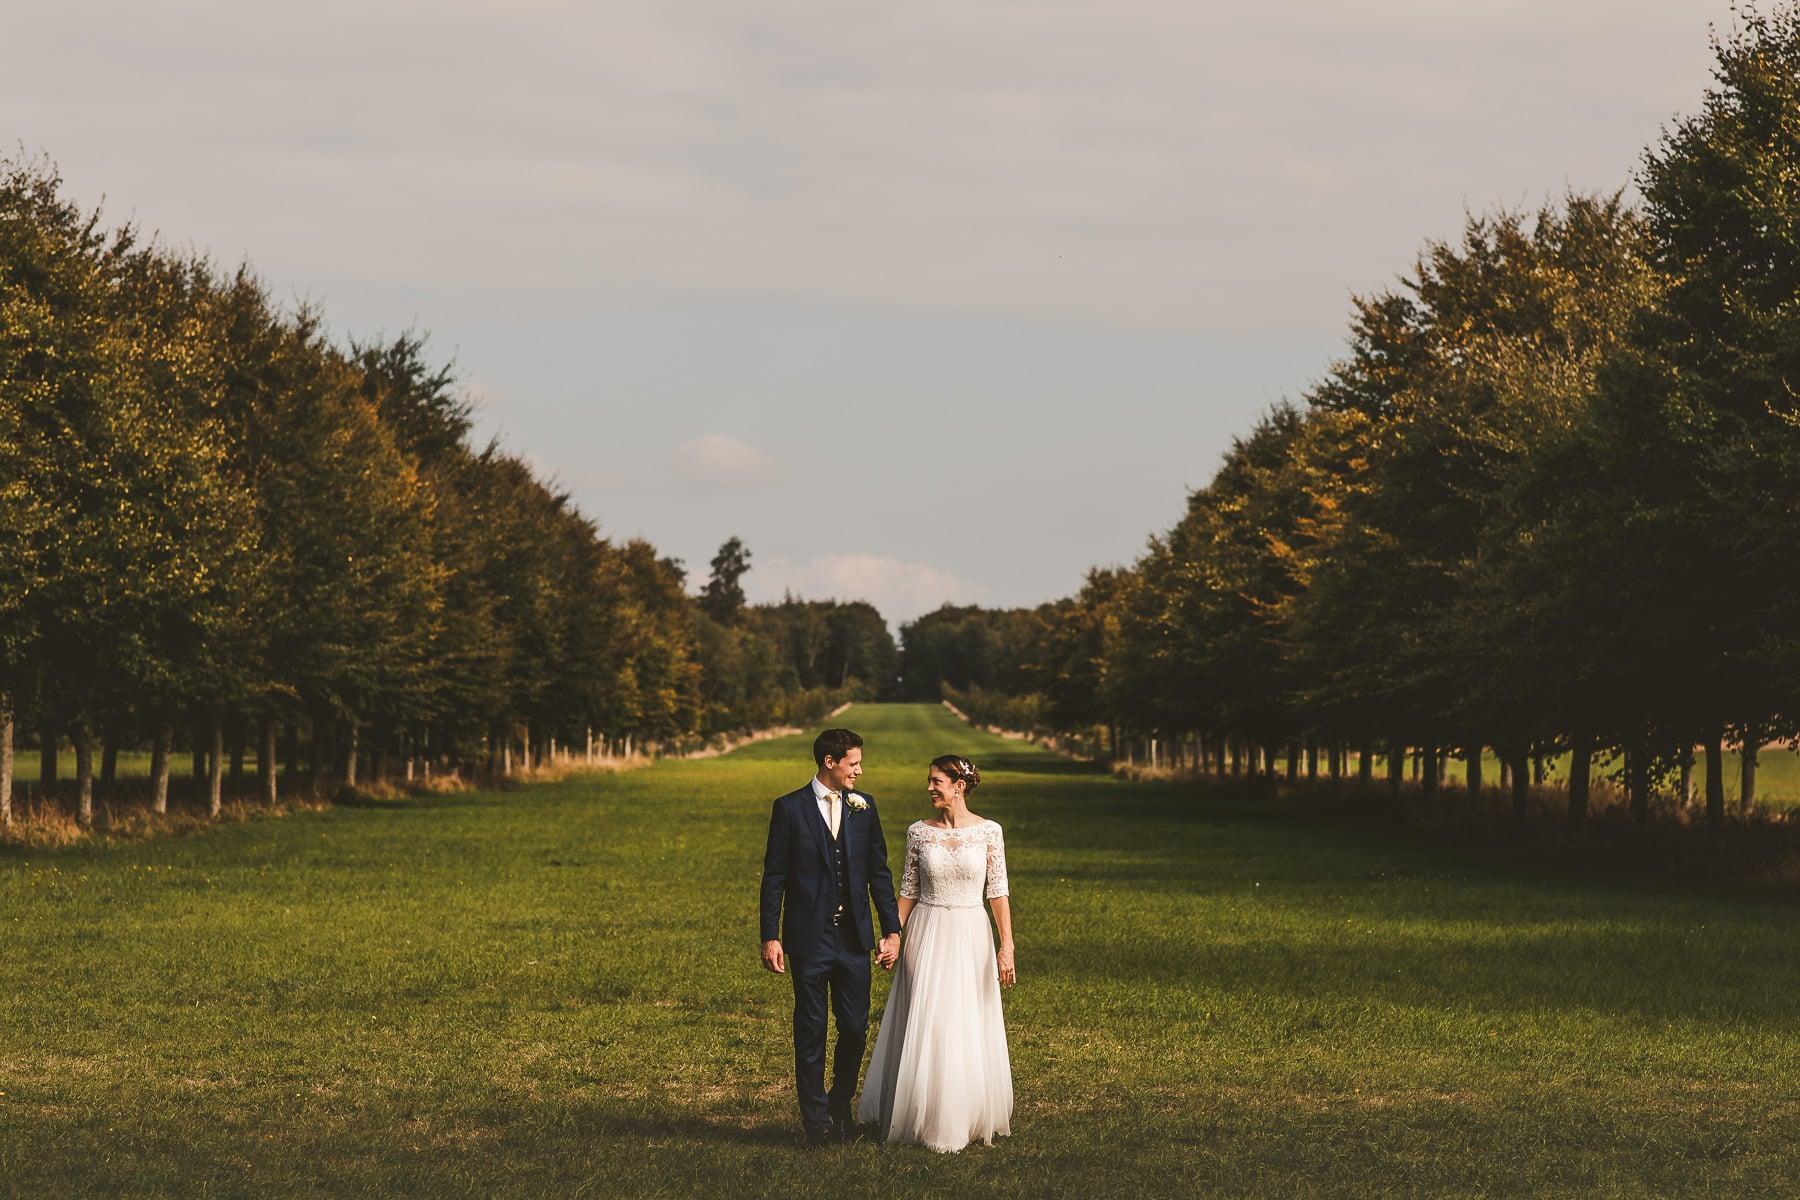 Dorset-weddings-at-St-Giles-House-Wimborne